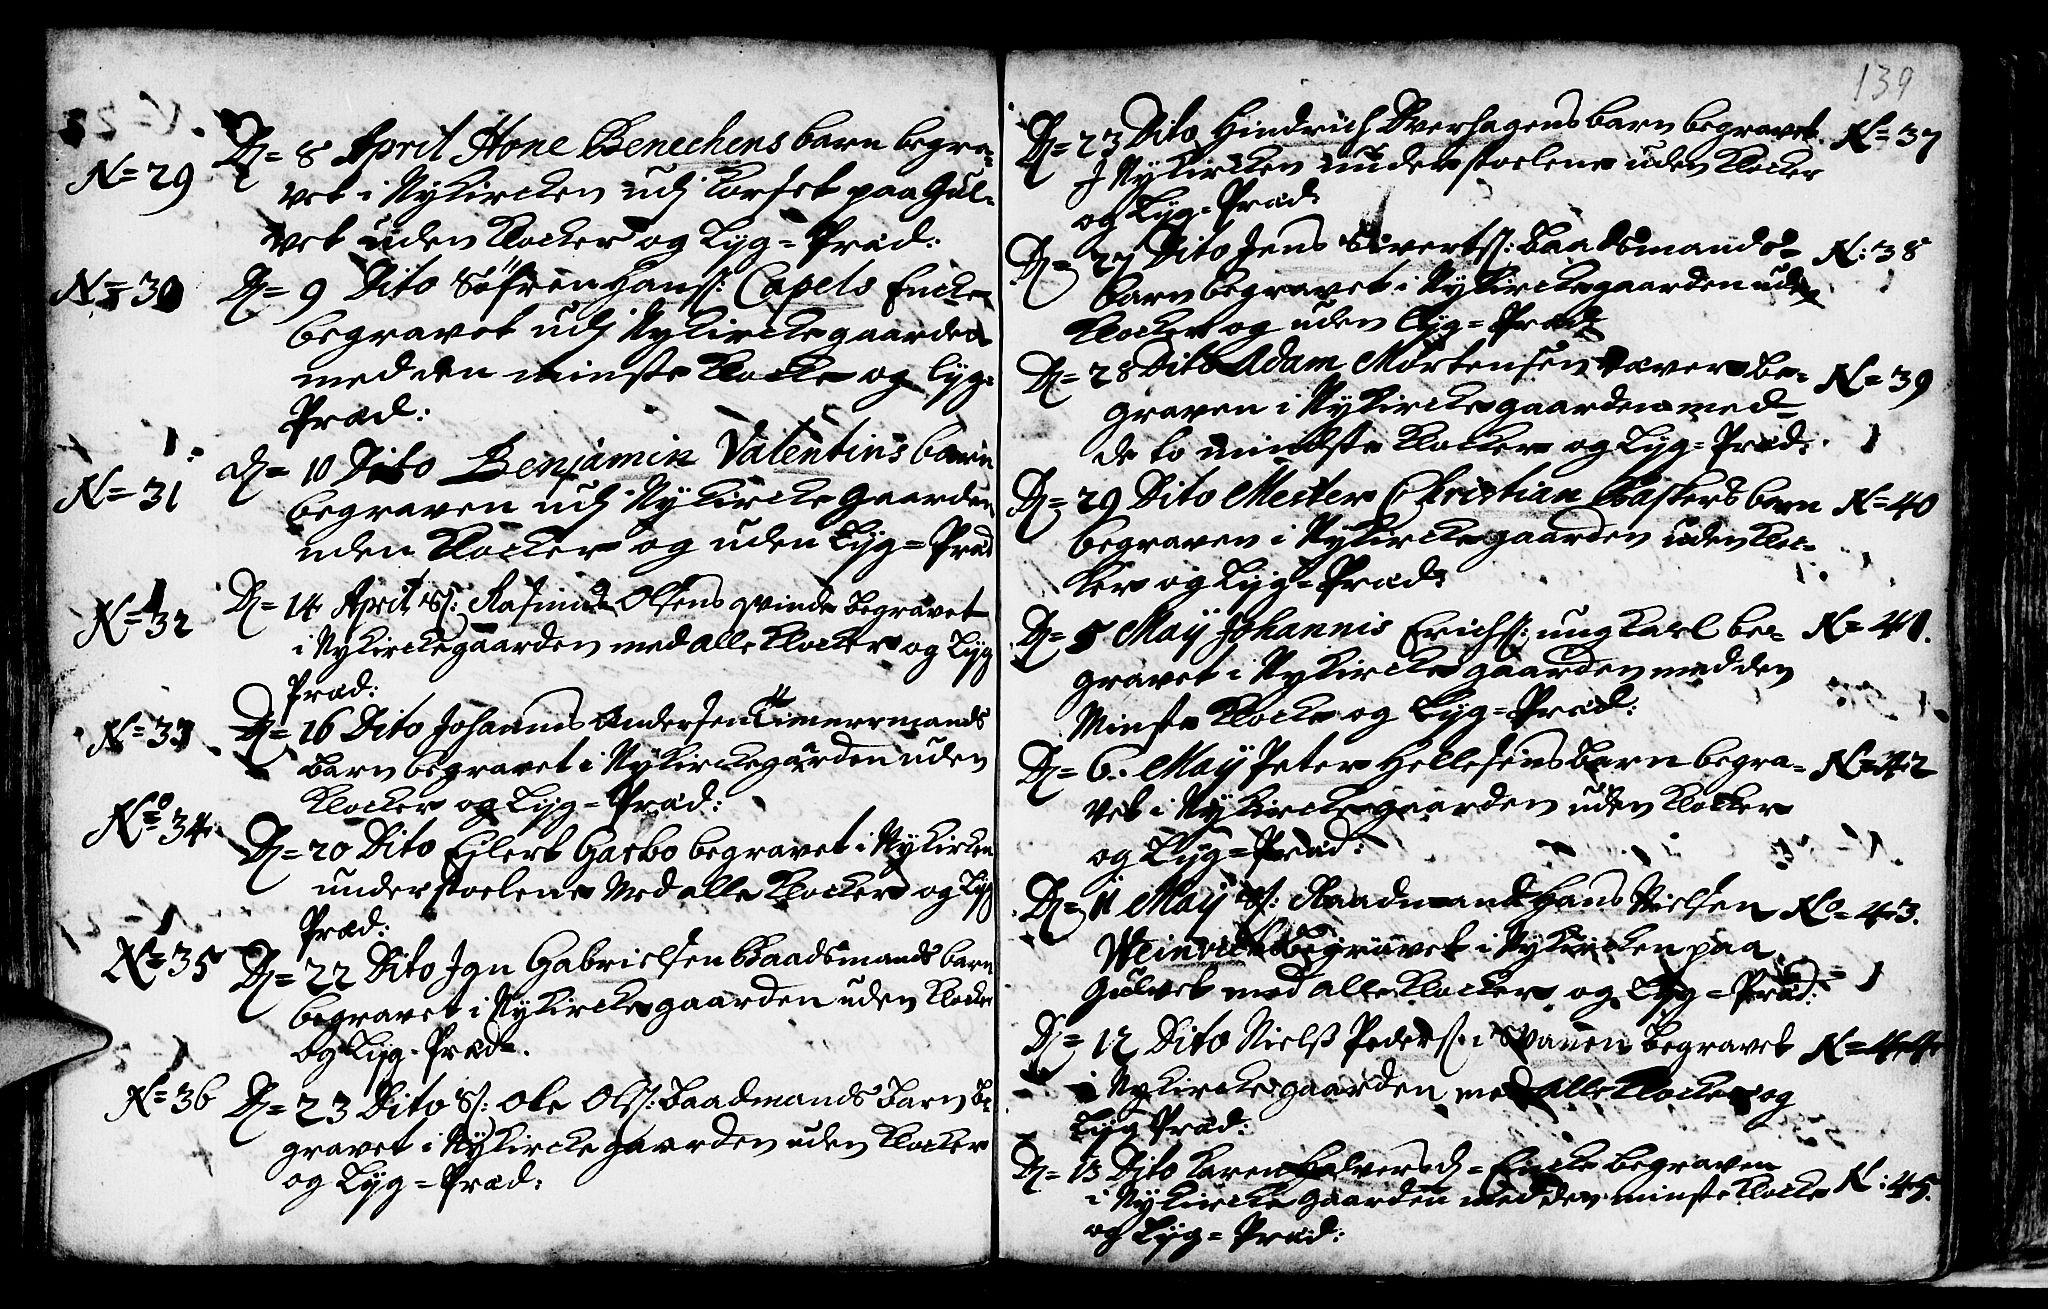 SAB, Nykirken Sokneprestembete, H/Haa: Ministerialbok nr. A 9, 1689-1759, s. 139